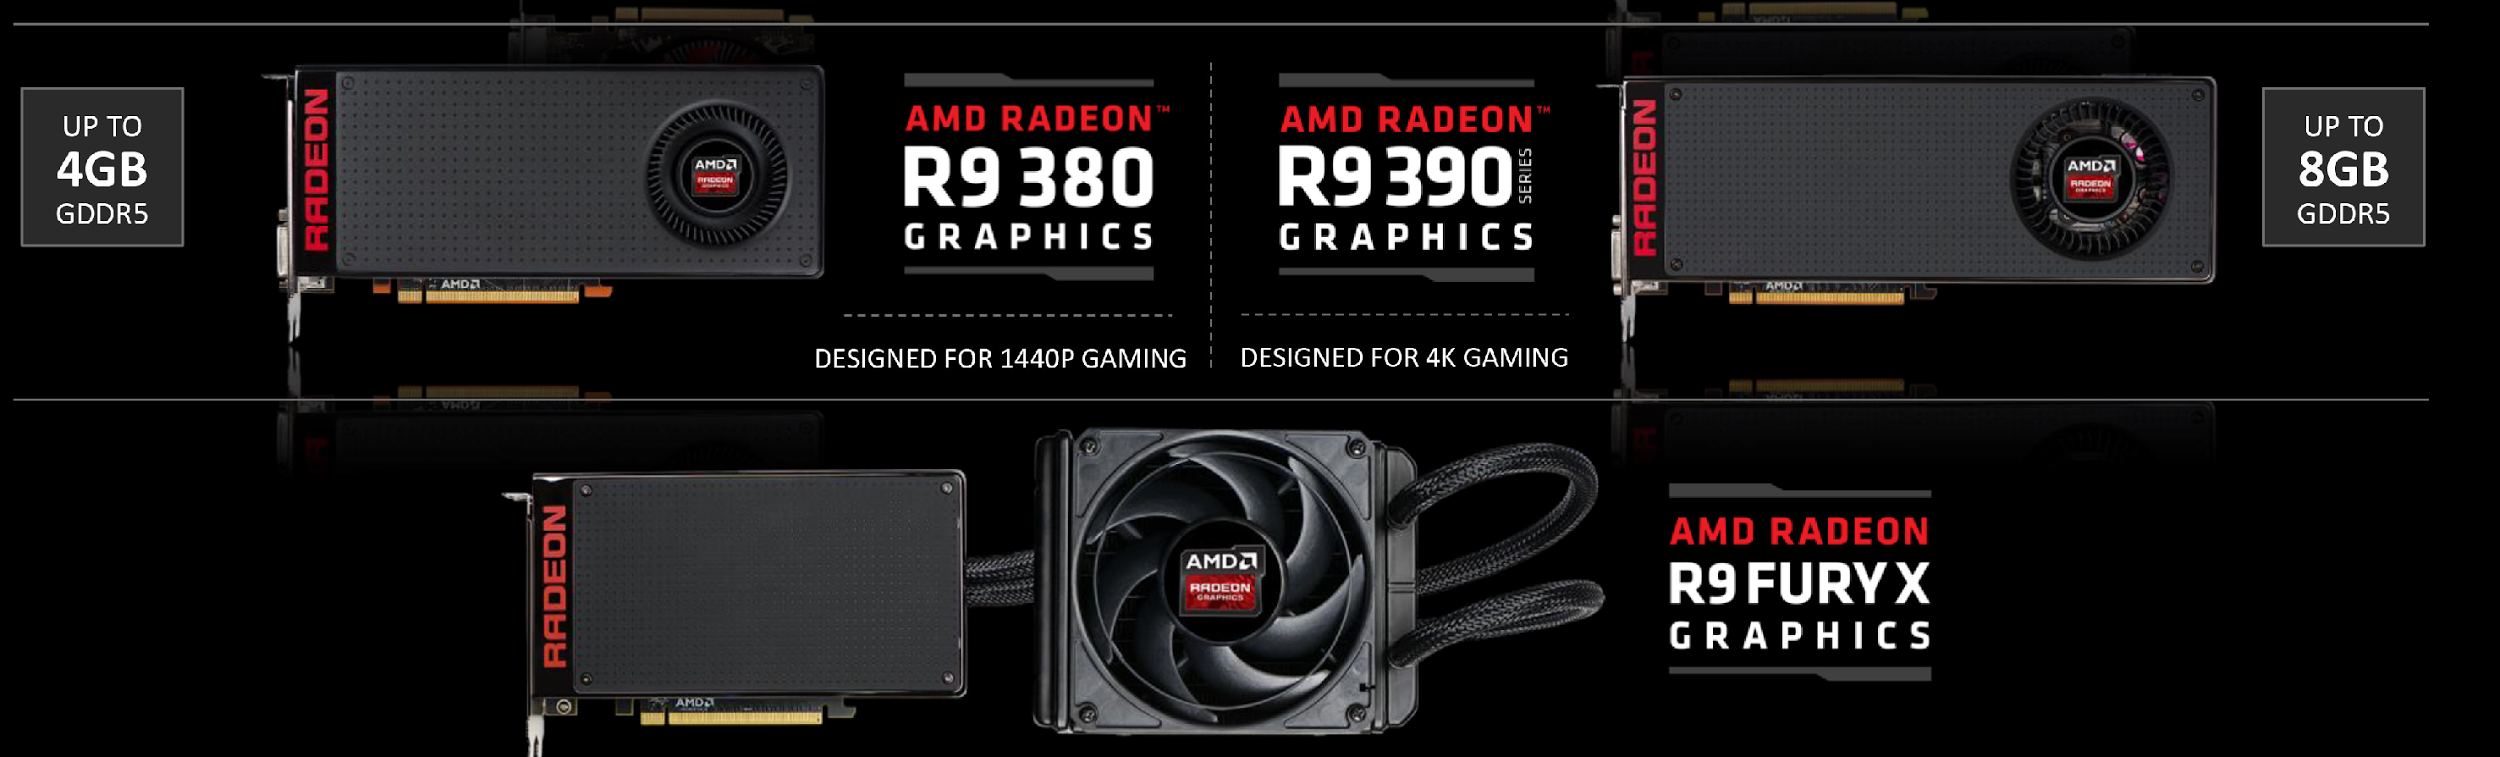 Рис. 1. Разнообразие видеокарт AMD Radeon